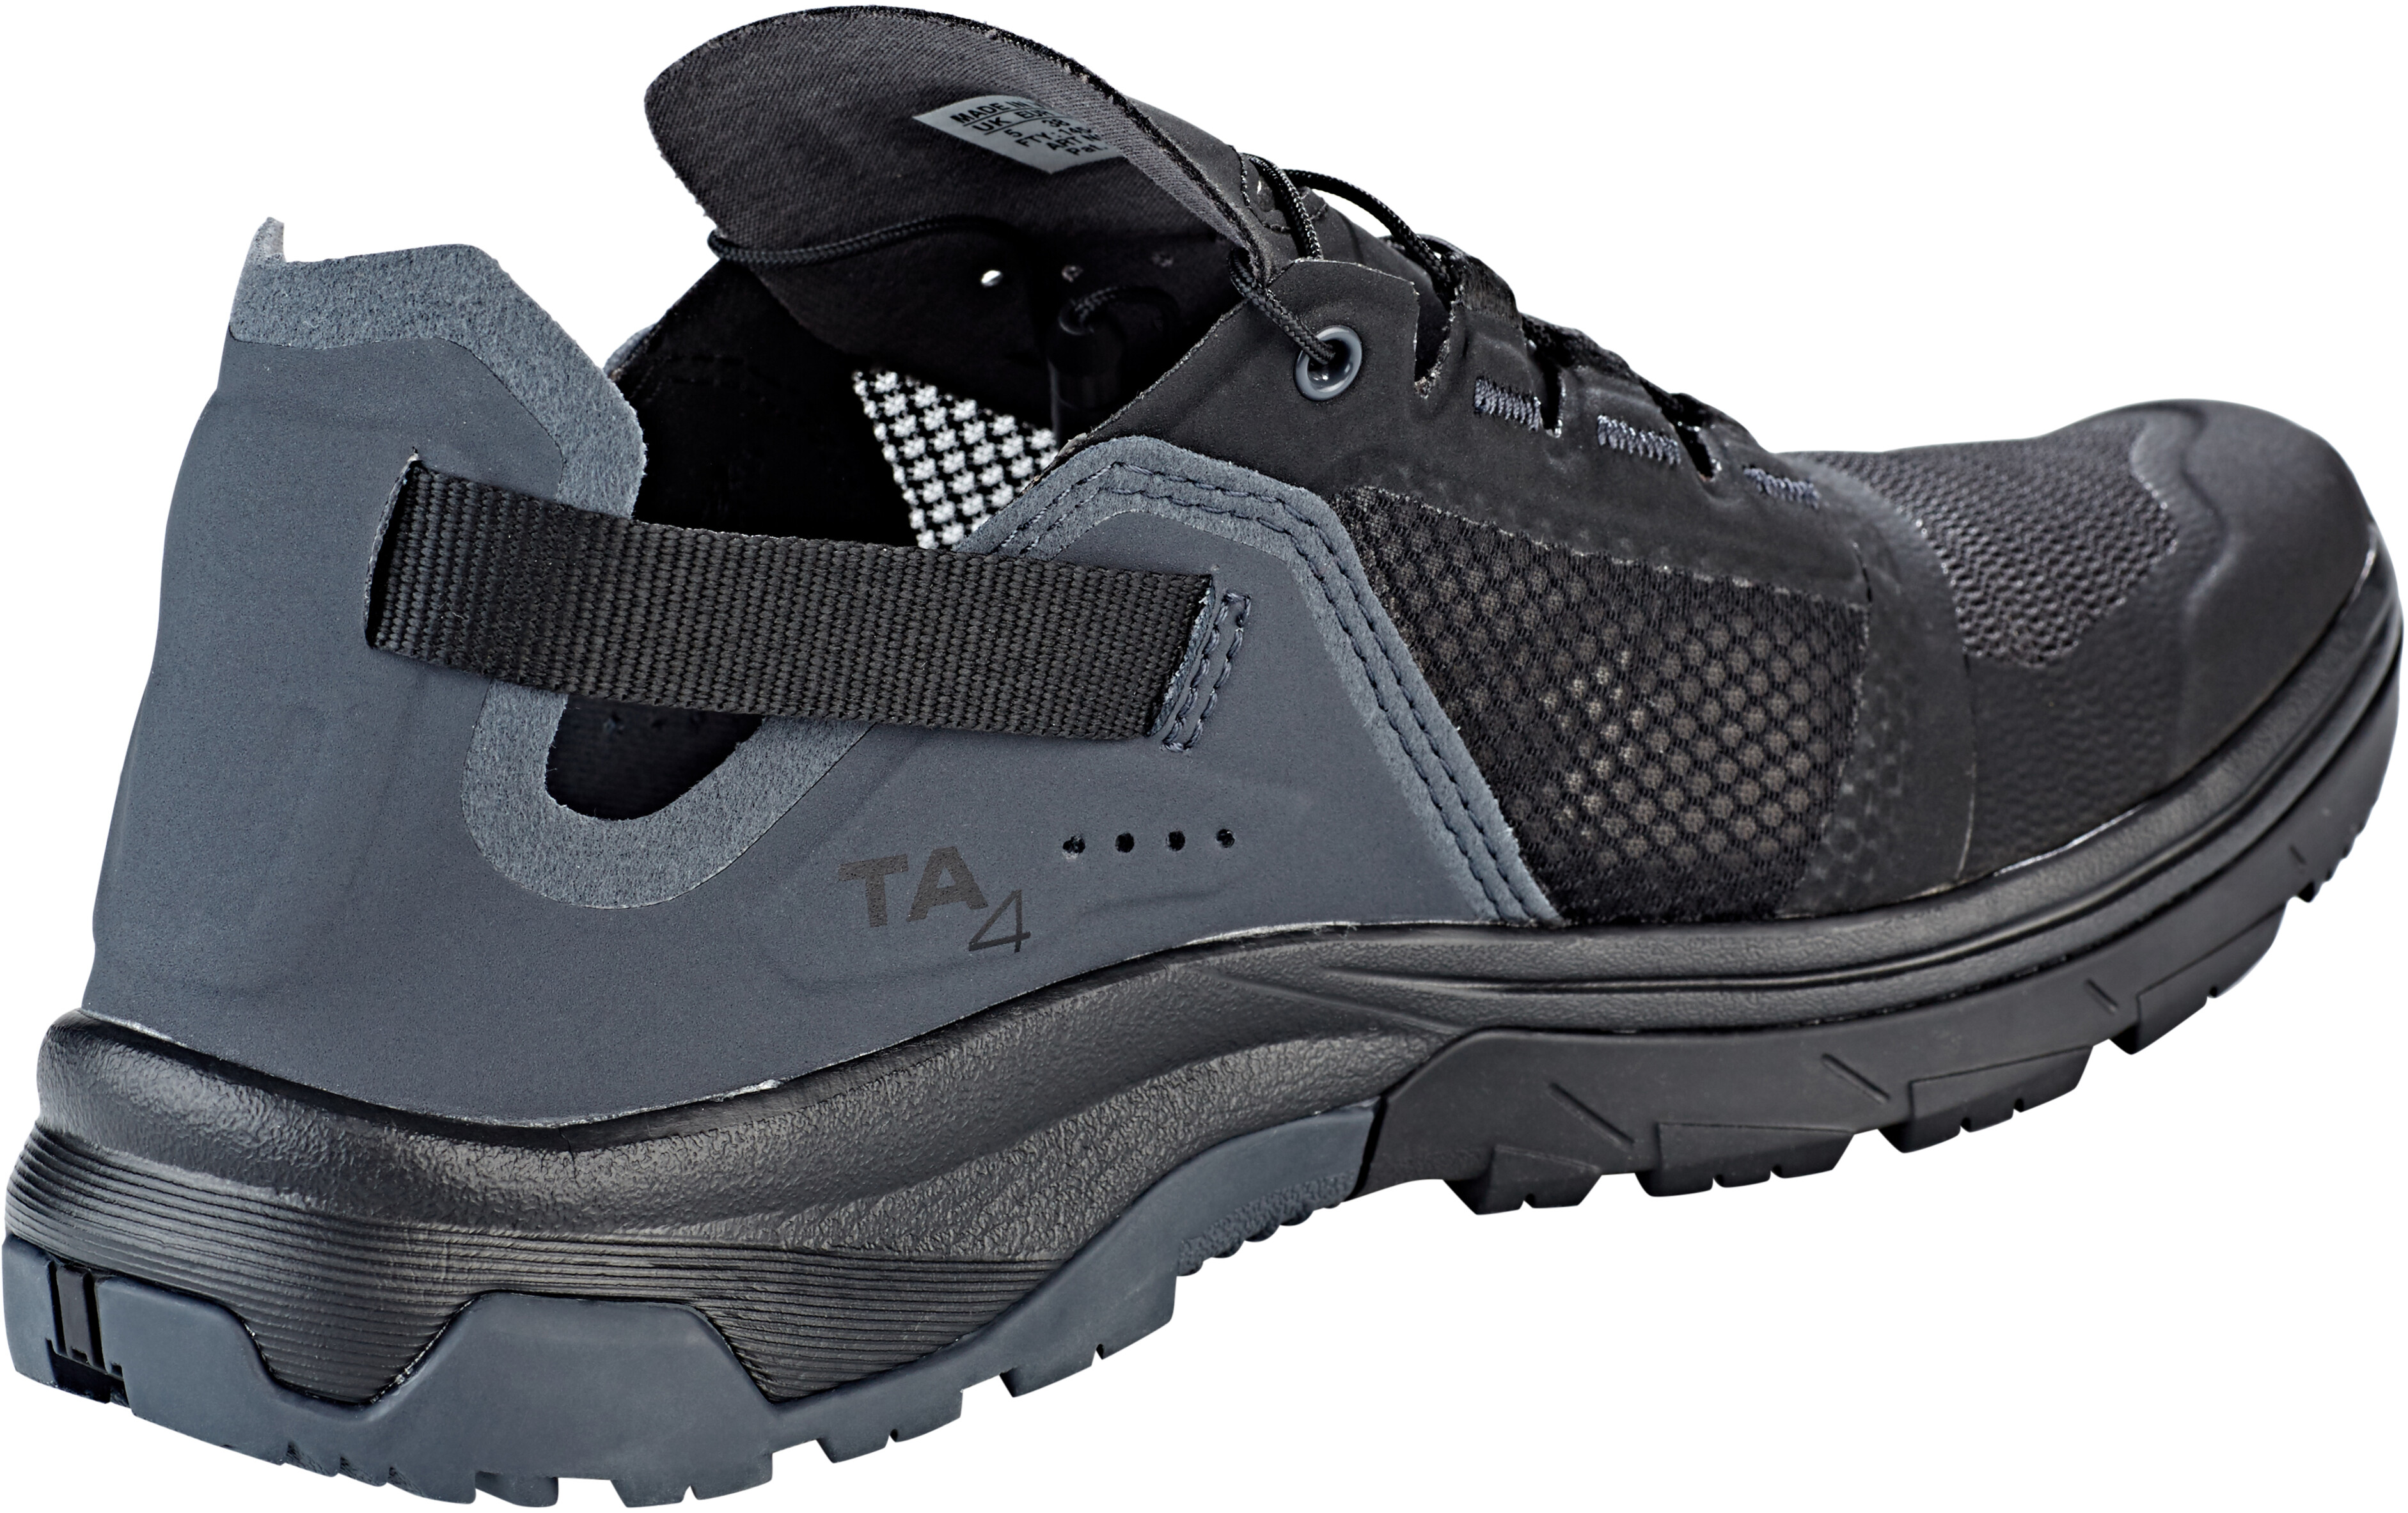 5e793513 Salomon Techamphibian 4 Shoes Women black/ebony/quiet shade | Gode ...